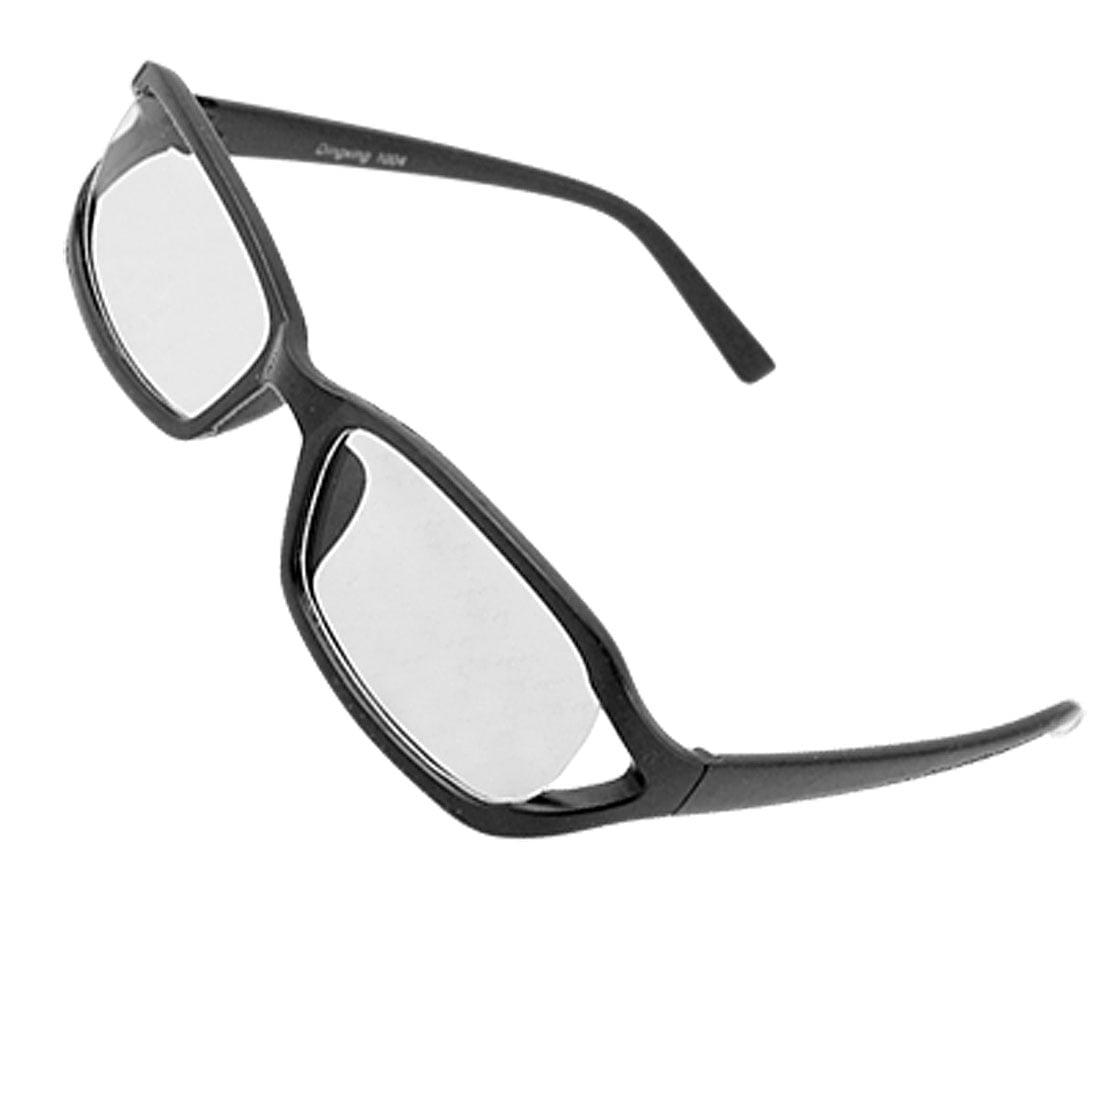 New Byblos Mens/Womens Designer Rimless Clear / Black Frame Demo Lenses Eyeglasses /Eyewear See Details Product - New Ice 3 Mens/Womens Designer Rimless Brown Frame Demo Lenses Eyeglasses/Eye Glasses.